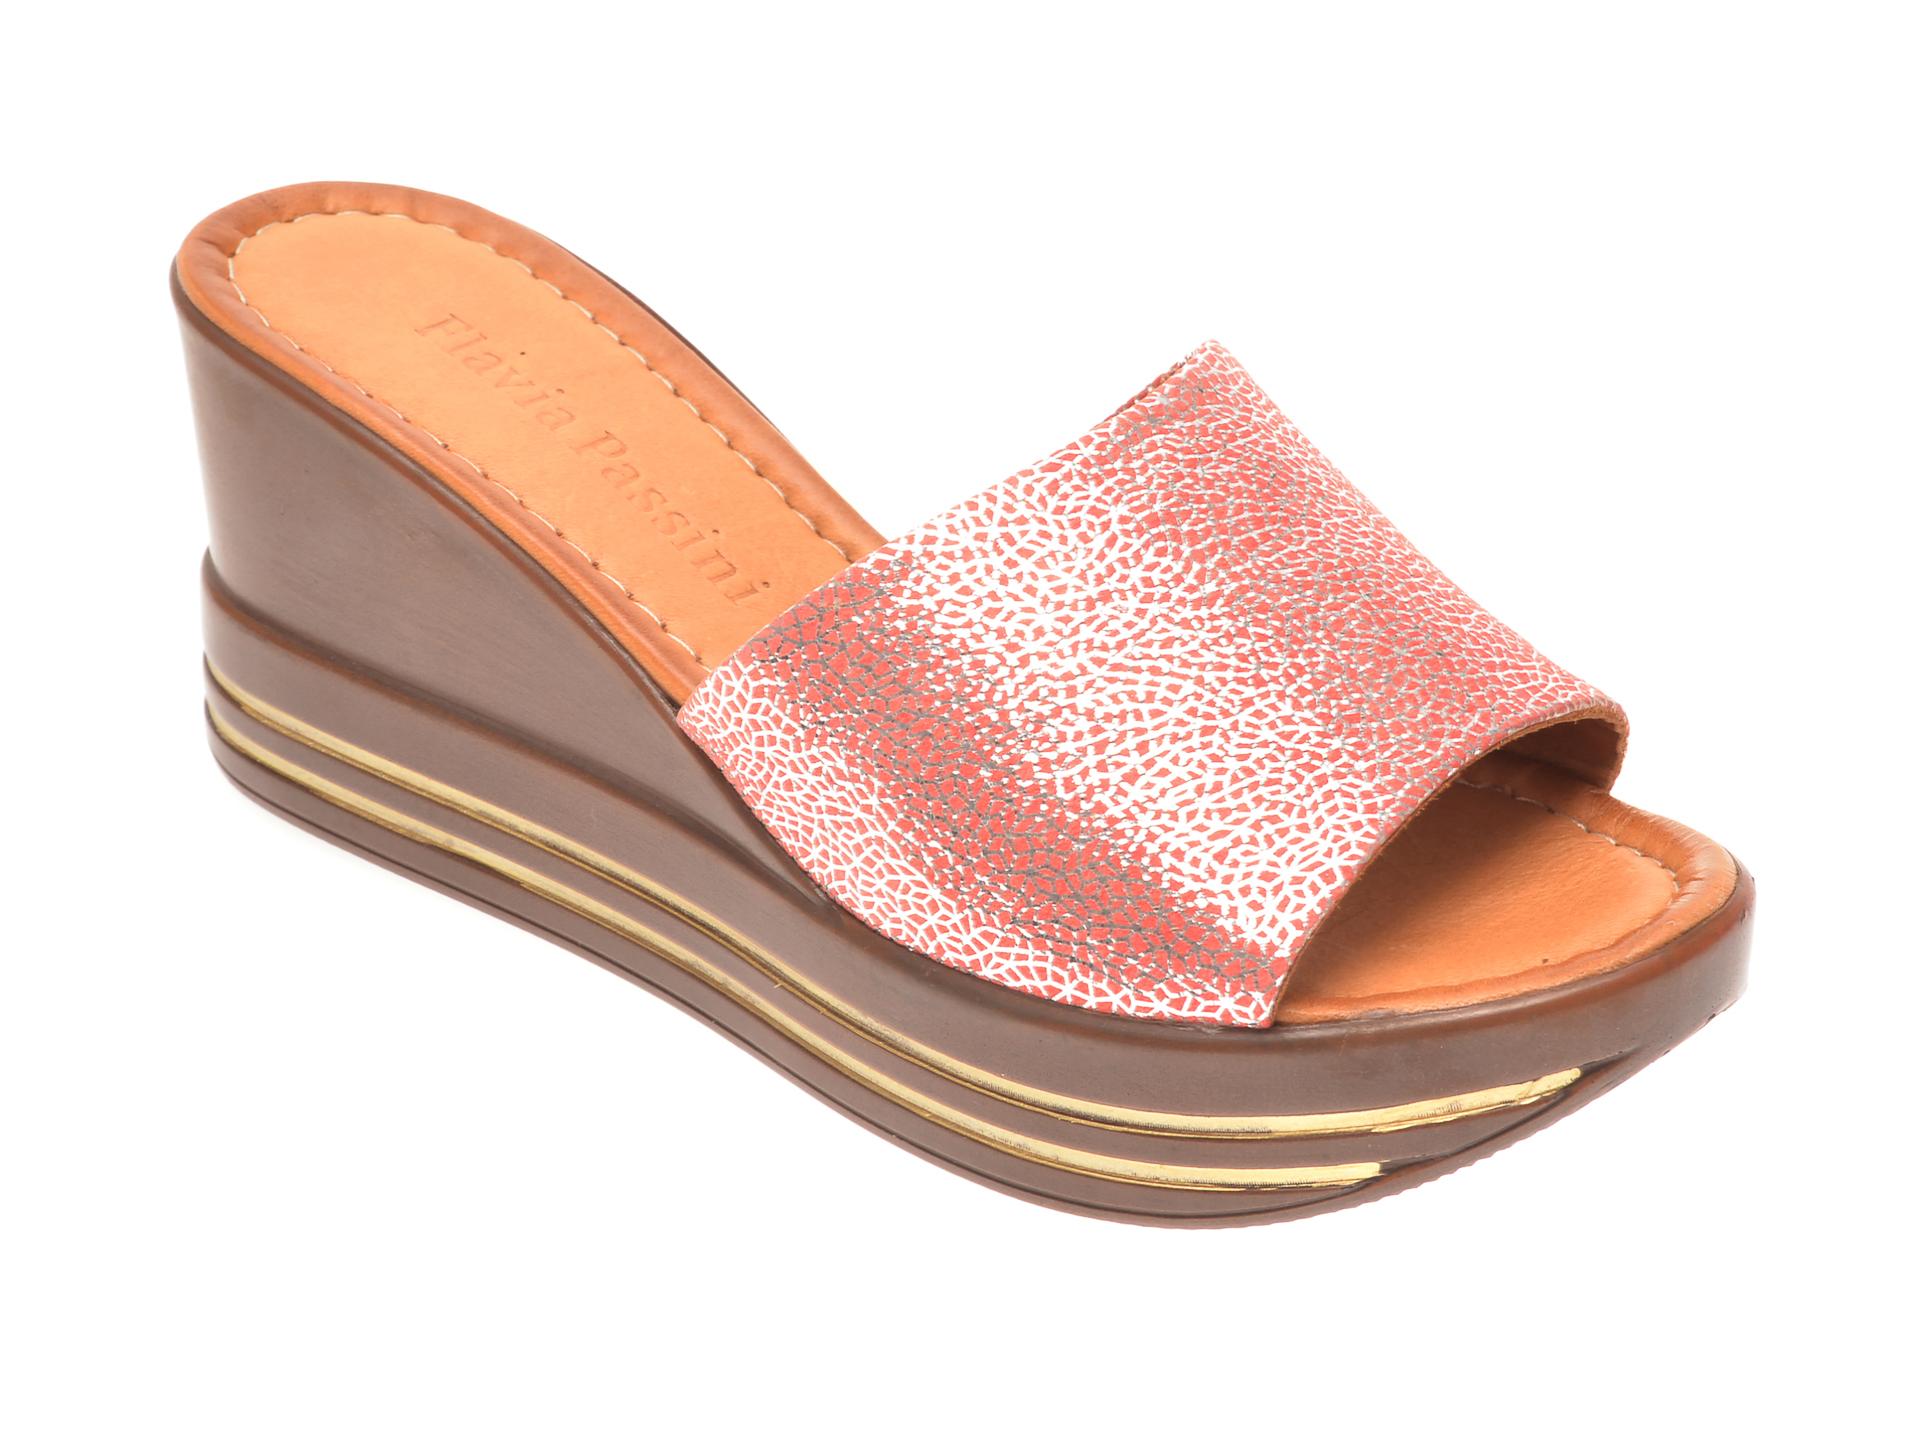 Papuci FLAVIA PASSINI roz, 1181513, din piele naturala